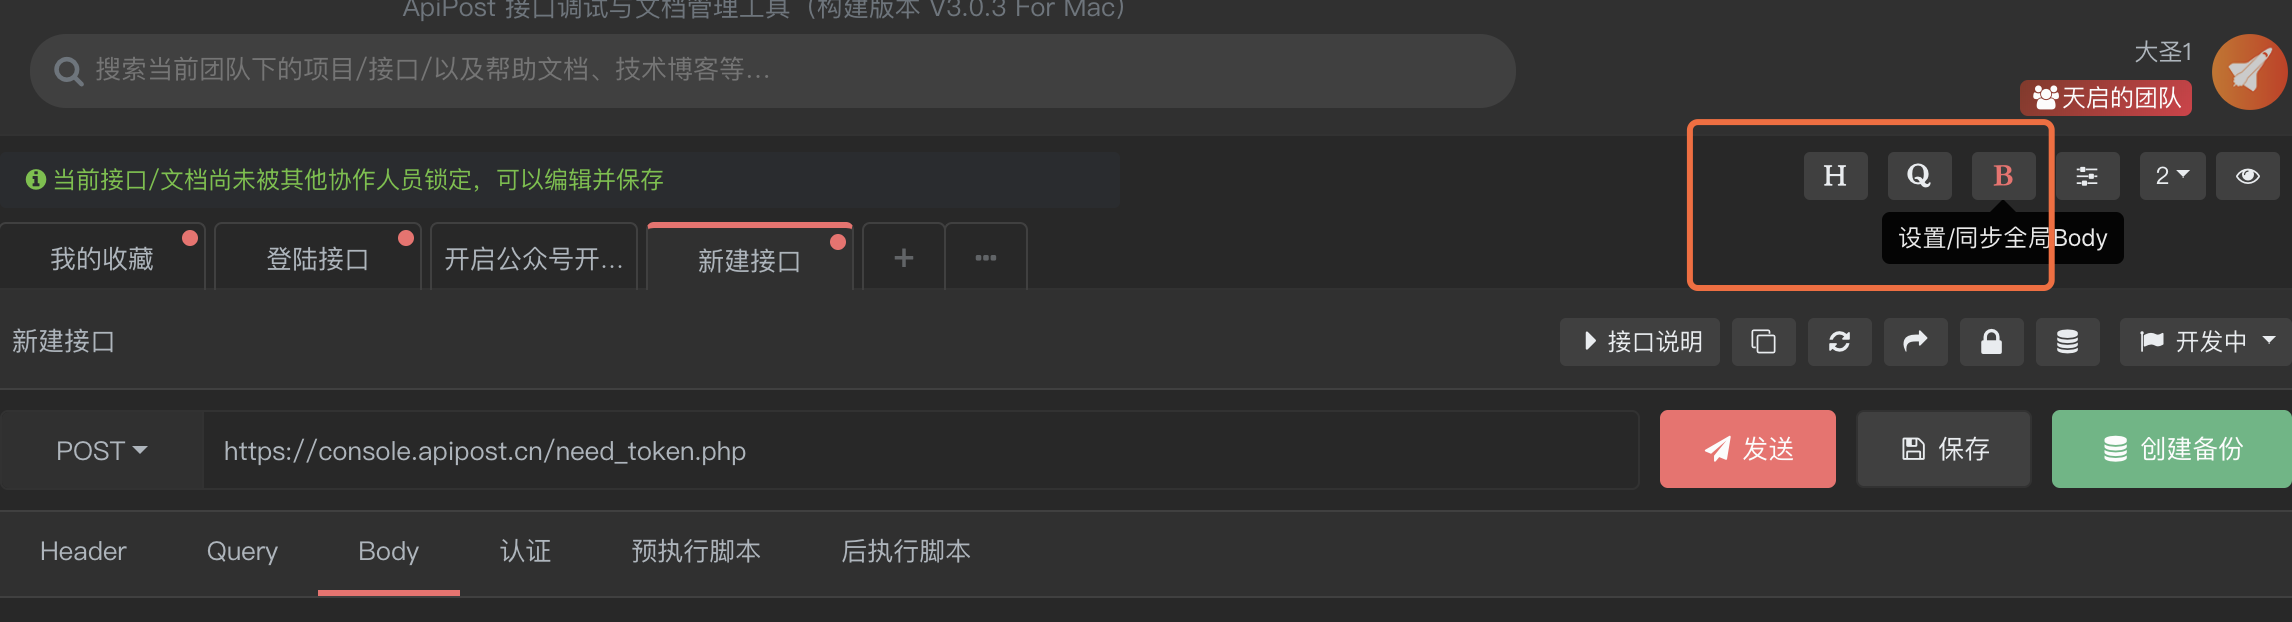 ApiPost V3 全局参数的使用